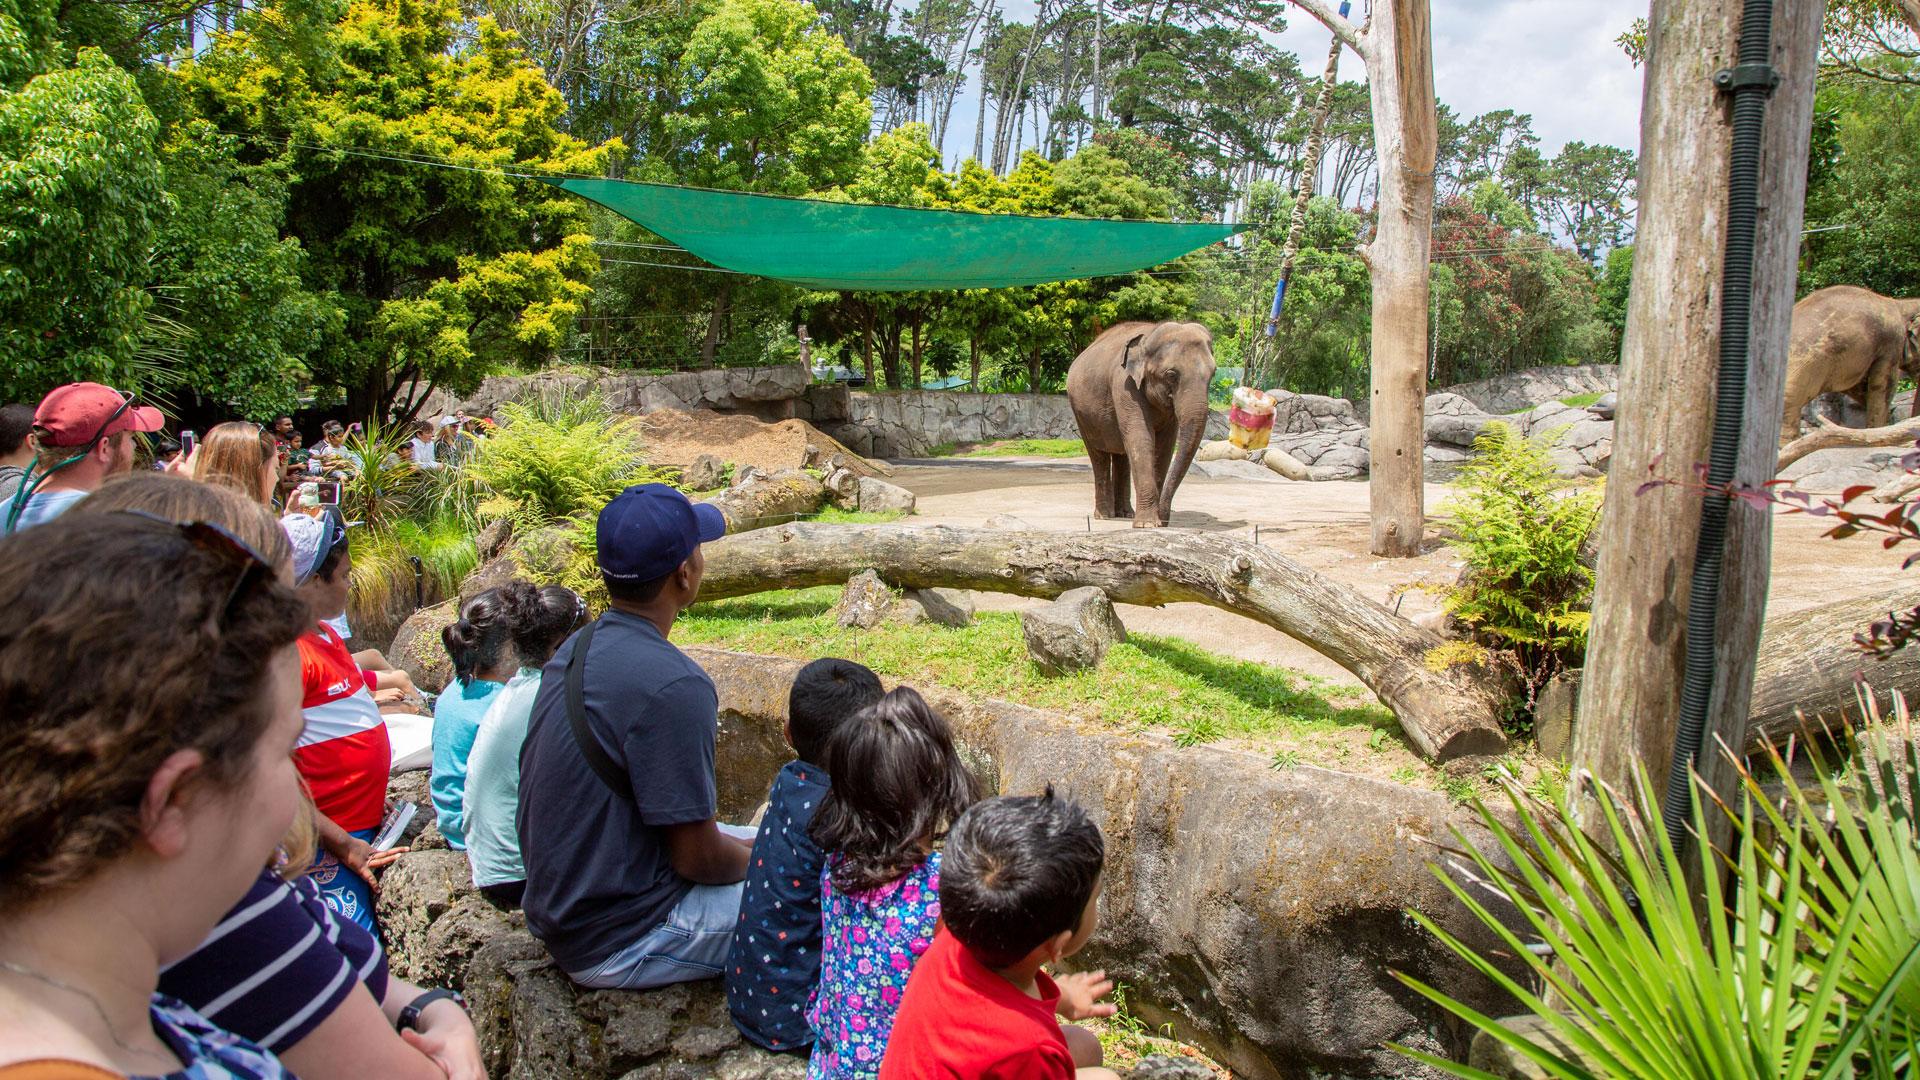 https://rfacdn.nz/zoo/assets/media/elephant-news-gallery-10.jpg